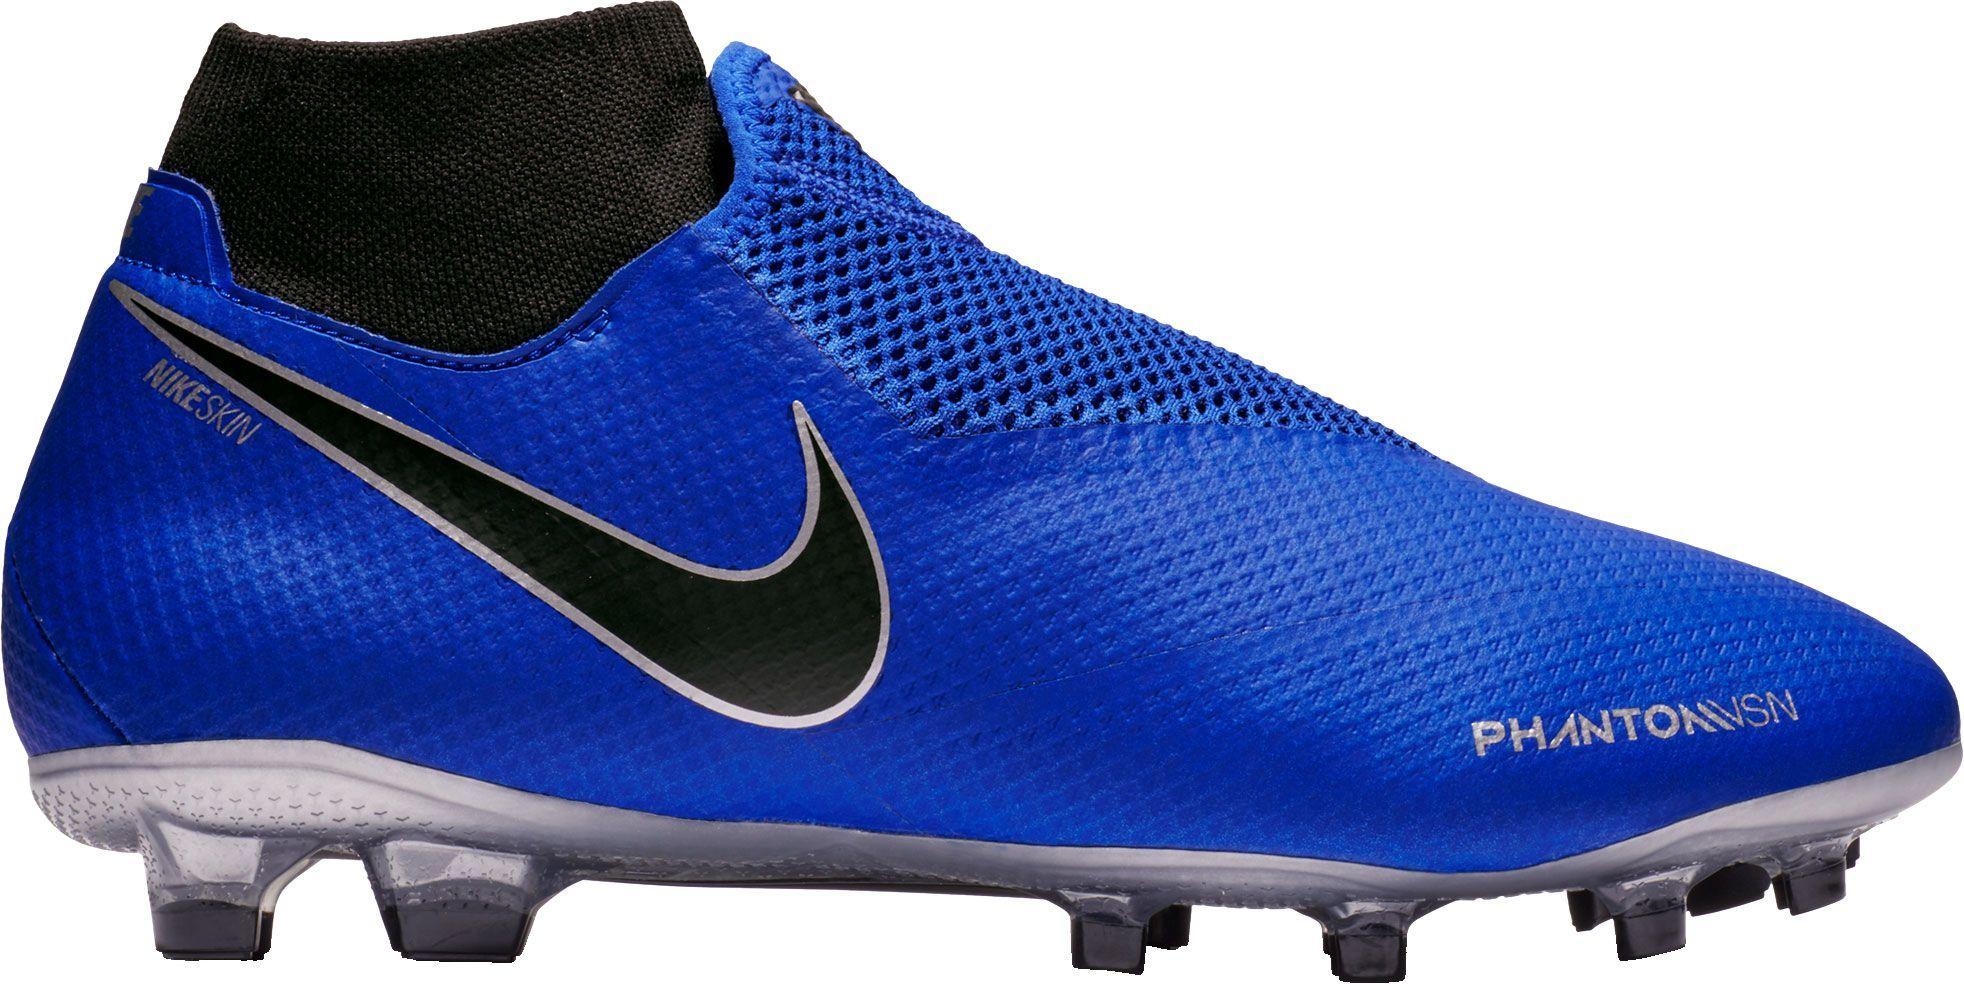 Nike Phantom Vision Pro Dynamic Fit Fg Soccer Cleats Men S Size M6 5 W8 Blue Soccer Cleats Soccer Shoes Nike